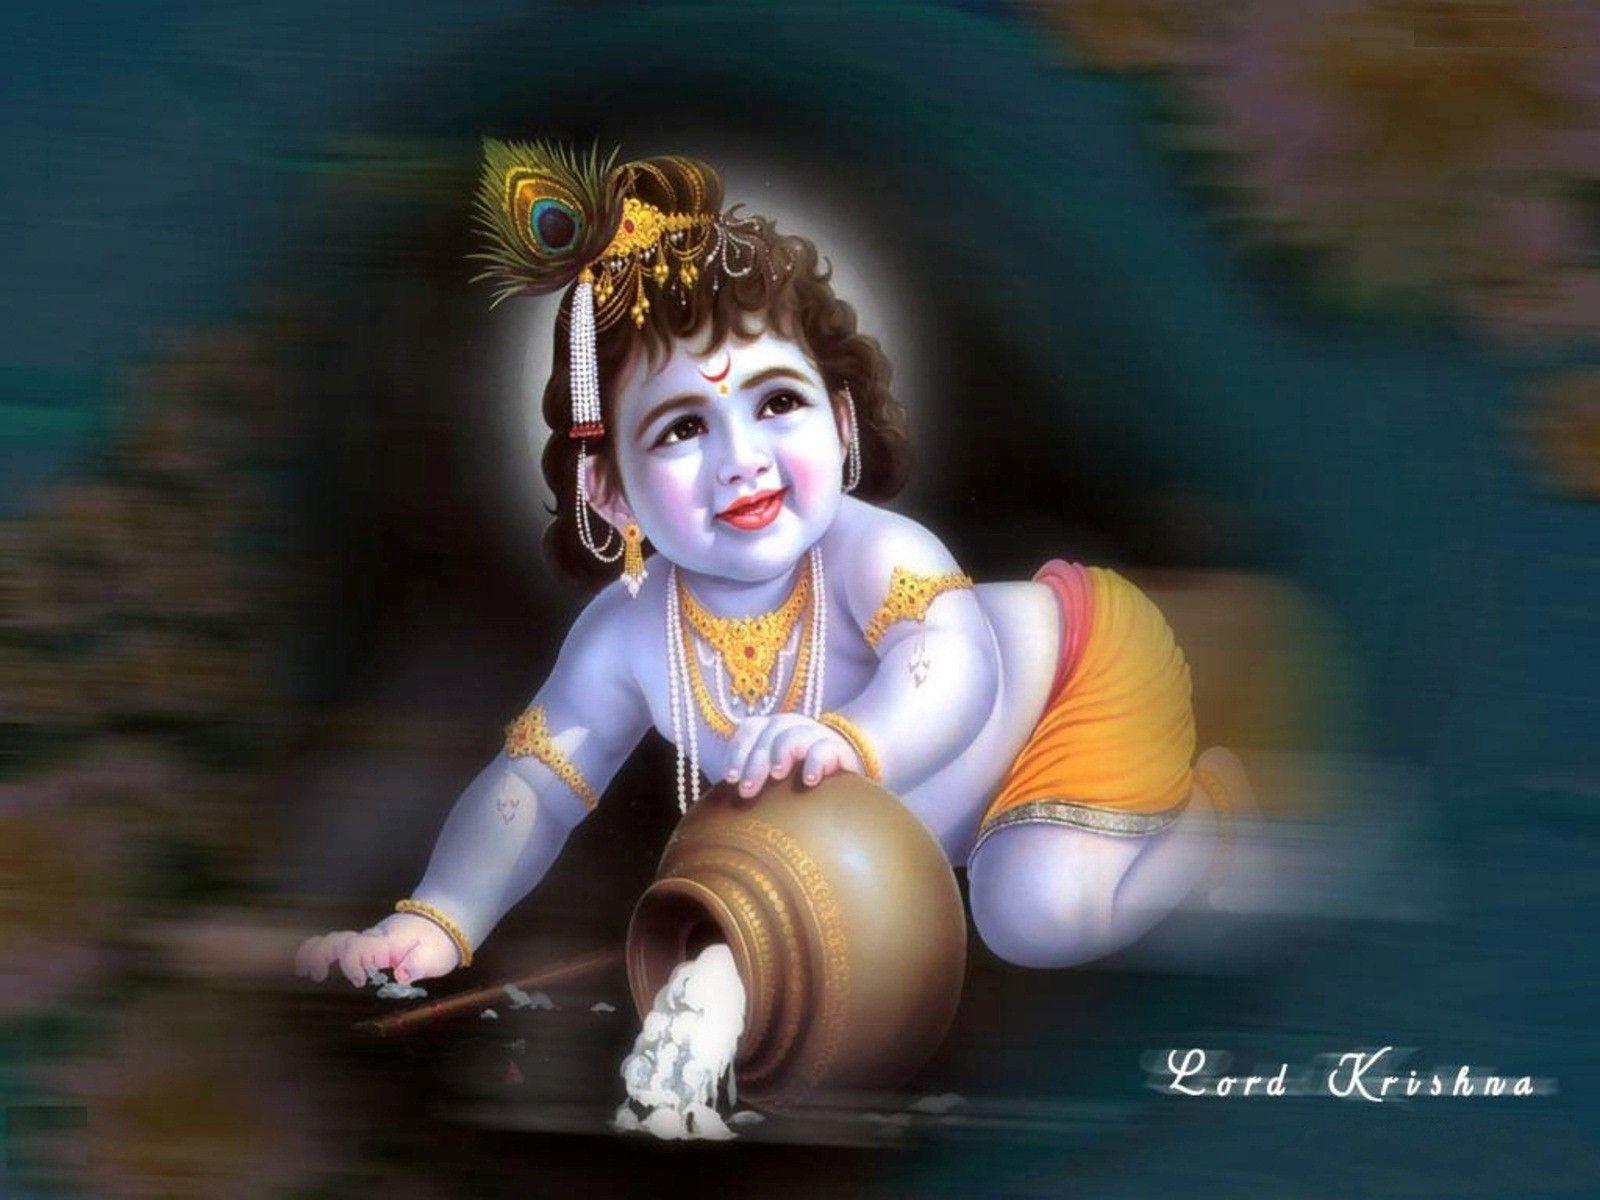 High Definition 1280x720 Baby Krishna Pic Google Search Krishna Wallpaper Lord Krishna Images Krishna Images